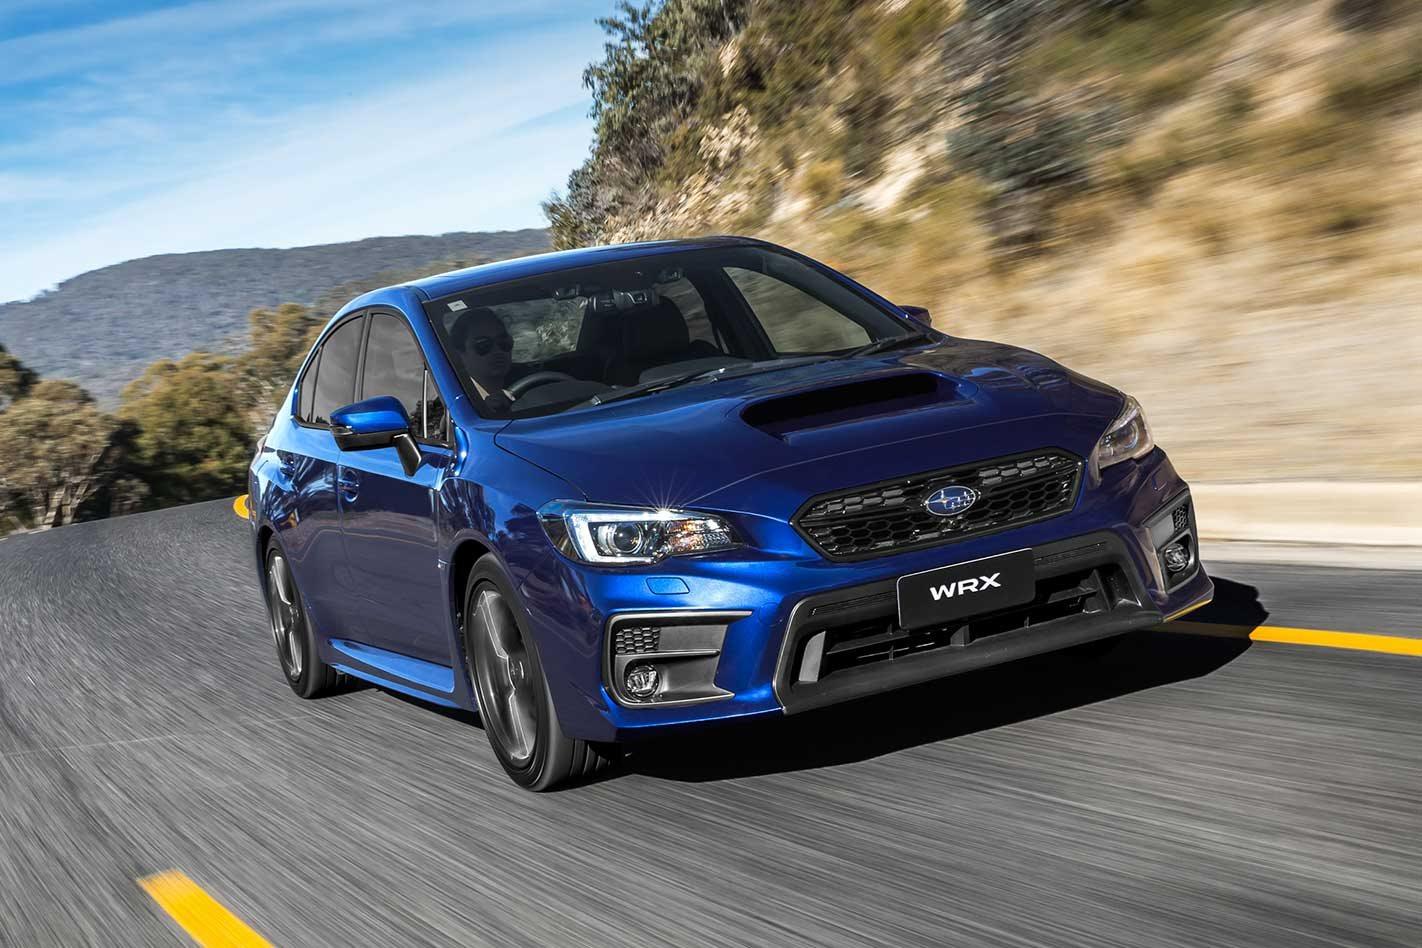 2019 Subaru WRX performance review